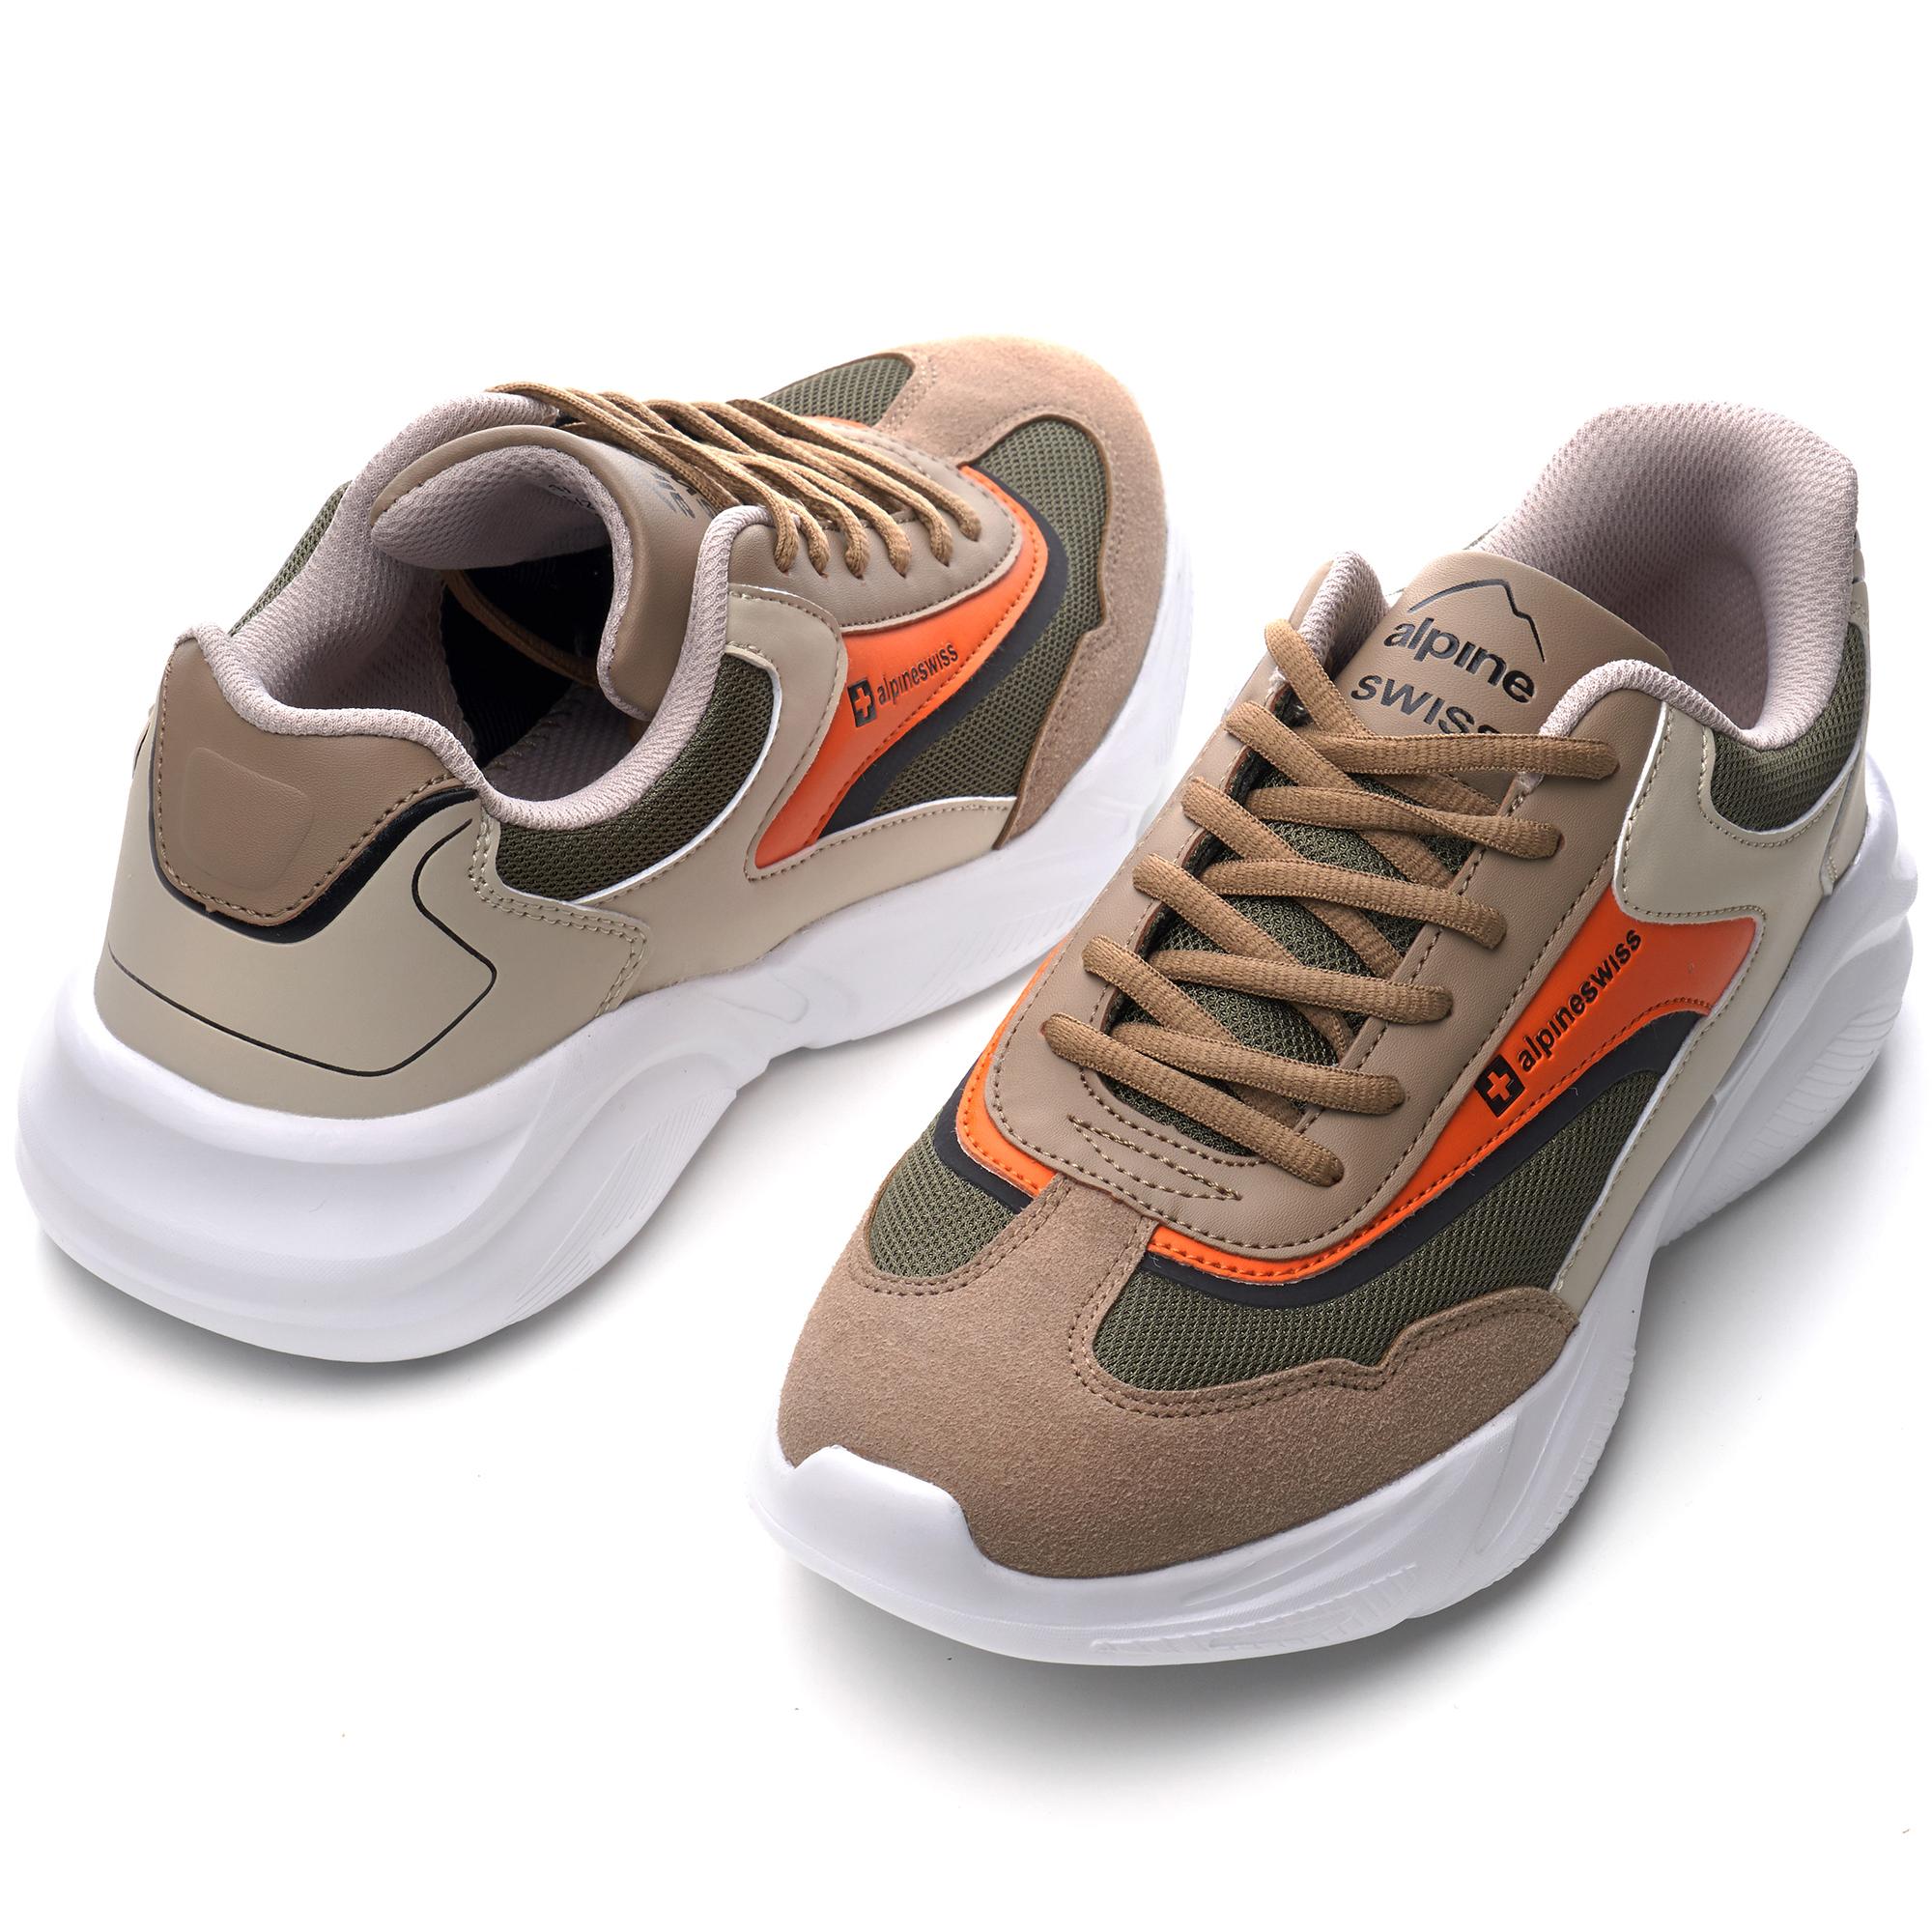 Alpine-Swiss-Stuart-Mens-Chunky-Sneakers-Retro-Platform-Dad-Tennis-Shoes thumbnail 33